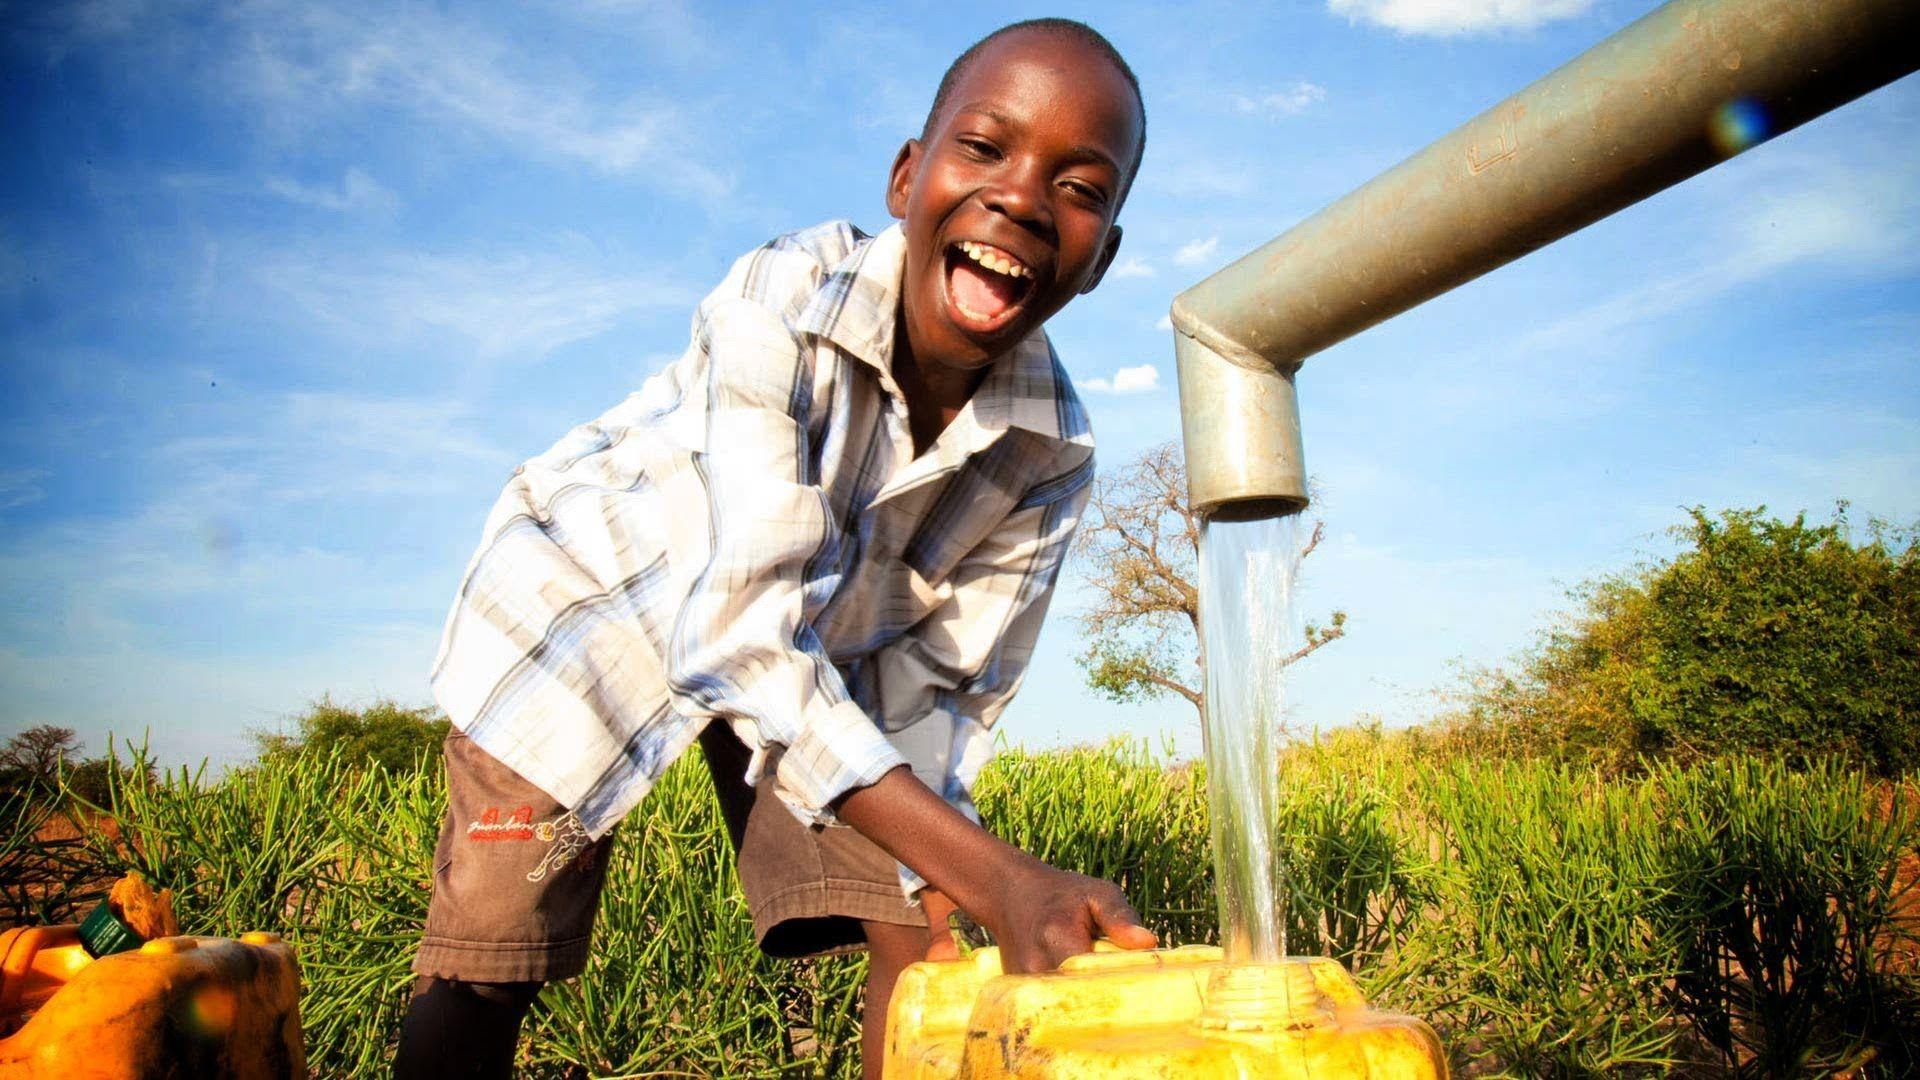 Session 8: World Vision: Every Child Deserves Clean Water | Clean water,  World vision, Drinking water